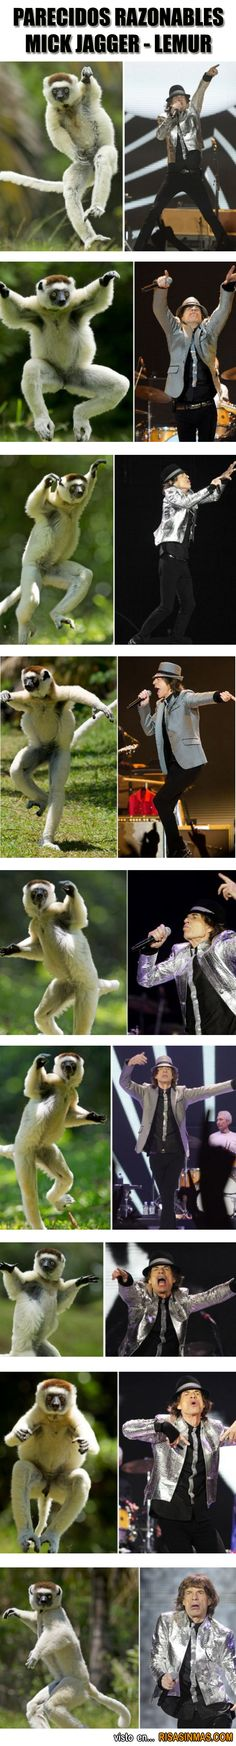 Parecidos razonables: Mick Jagger - Lemur.